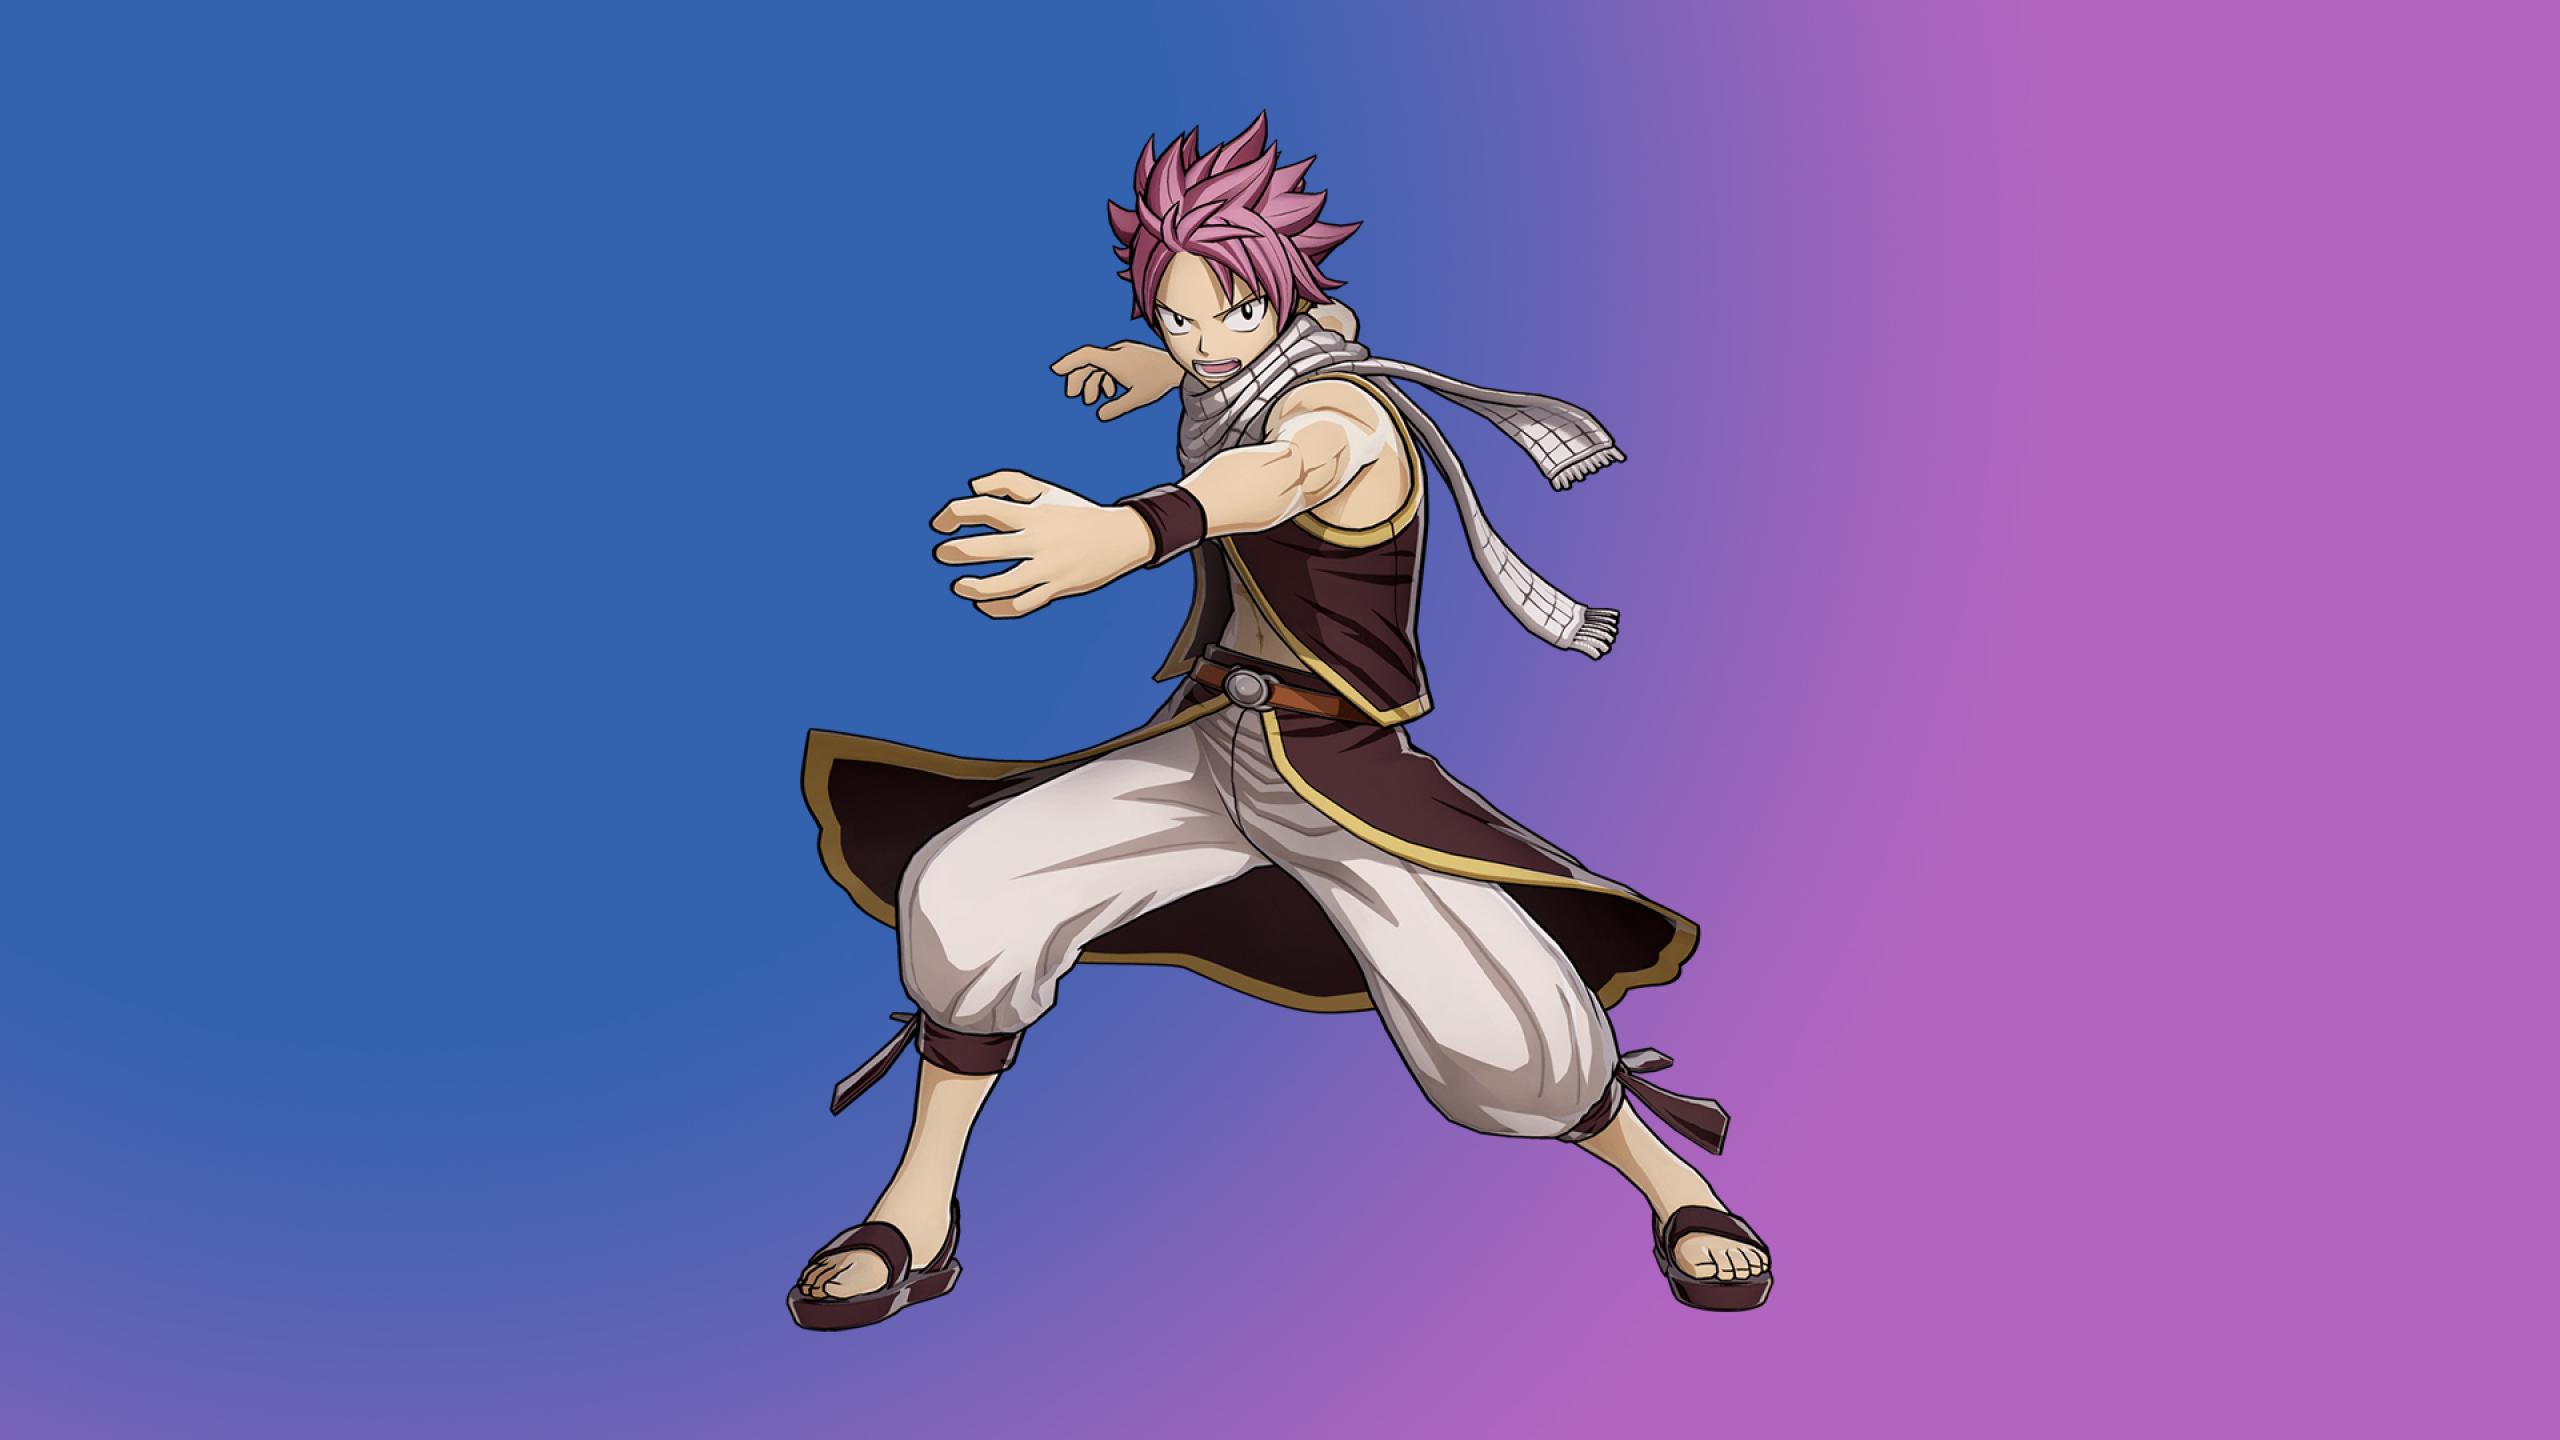 2560x1440 Natsu Dragneel In Fairy Tail